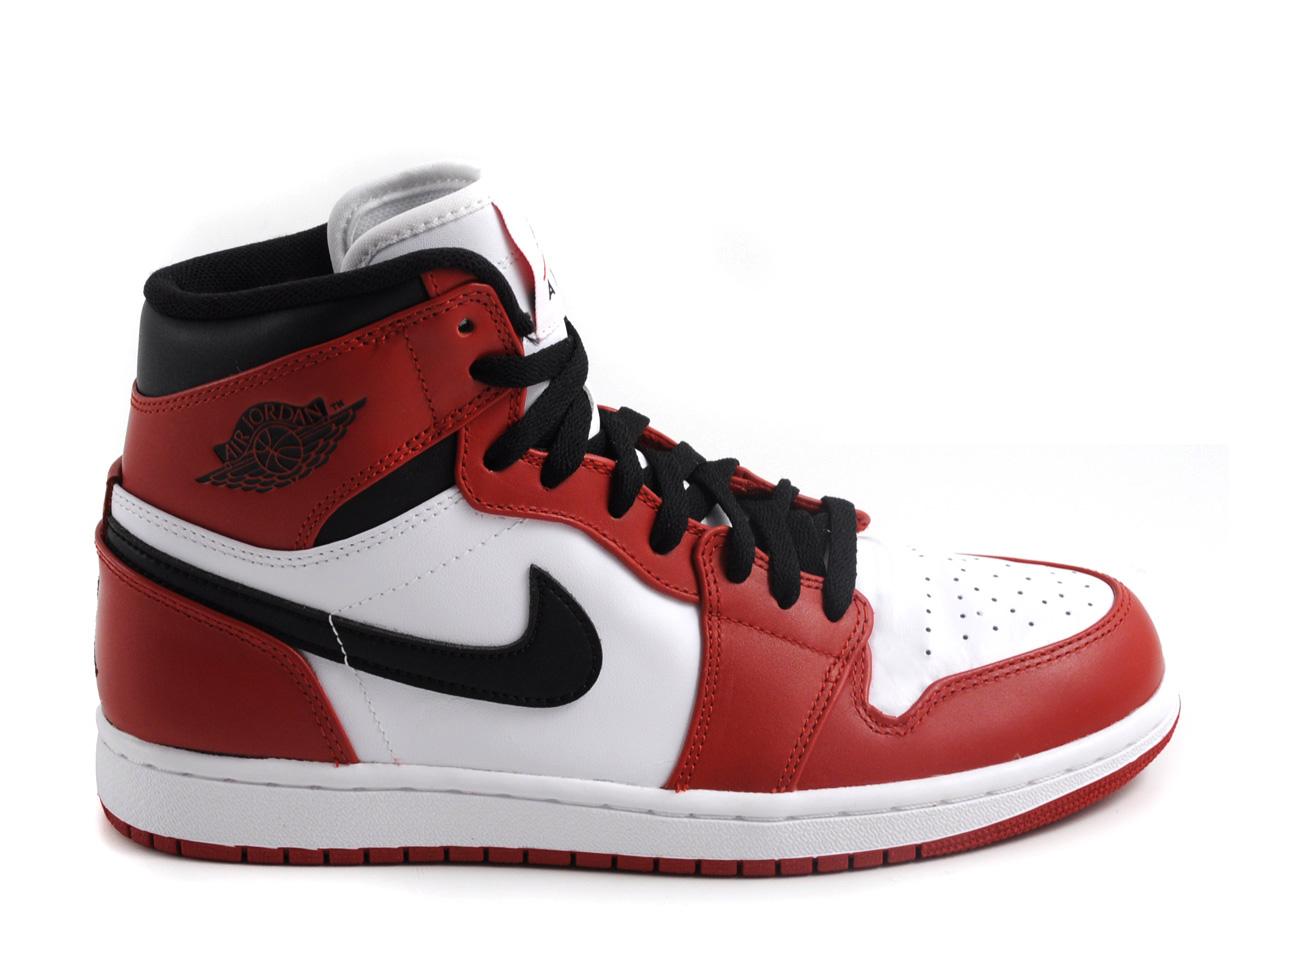 nike-air-jordan-1-retro-white-varisty-red-black-1